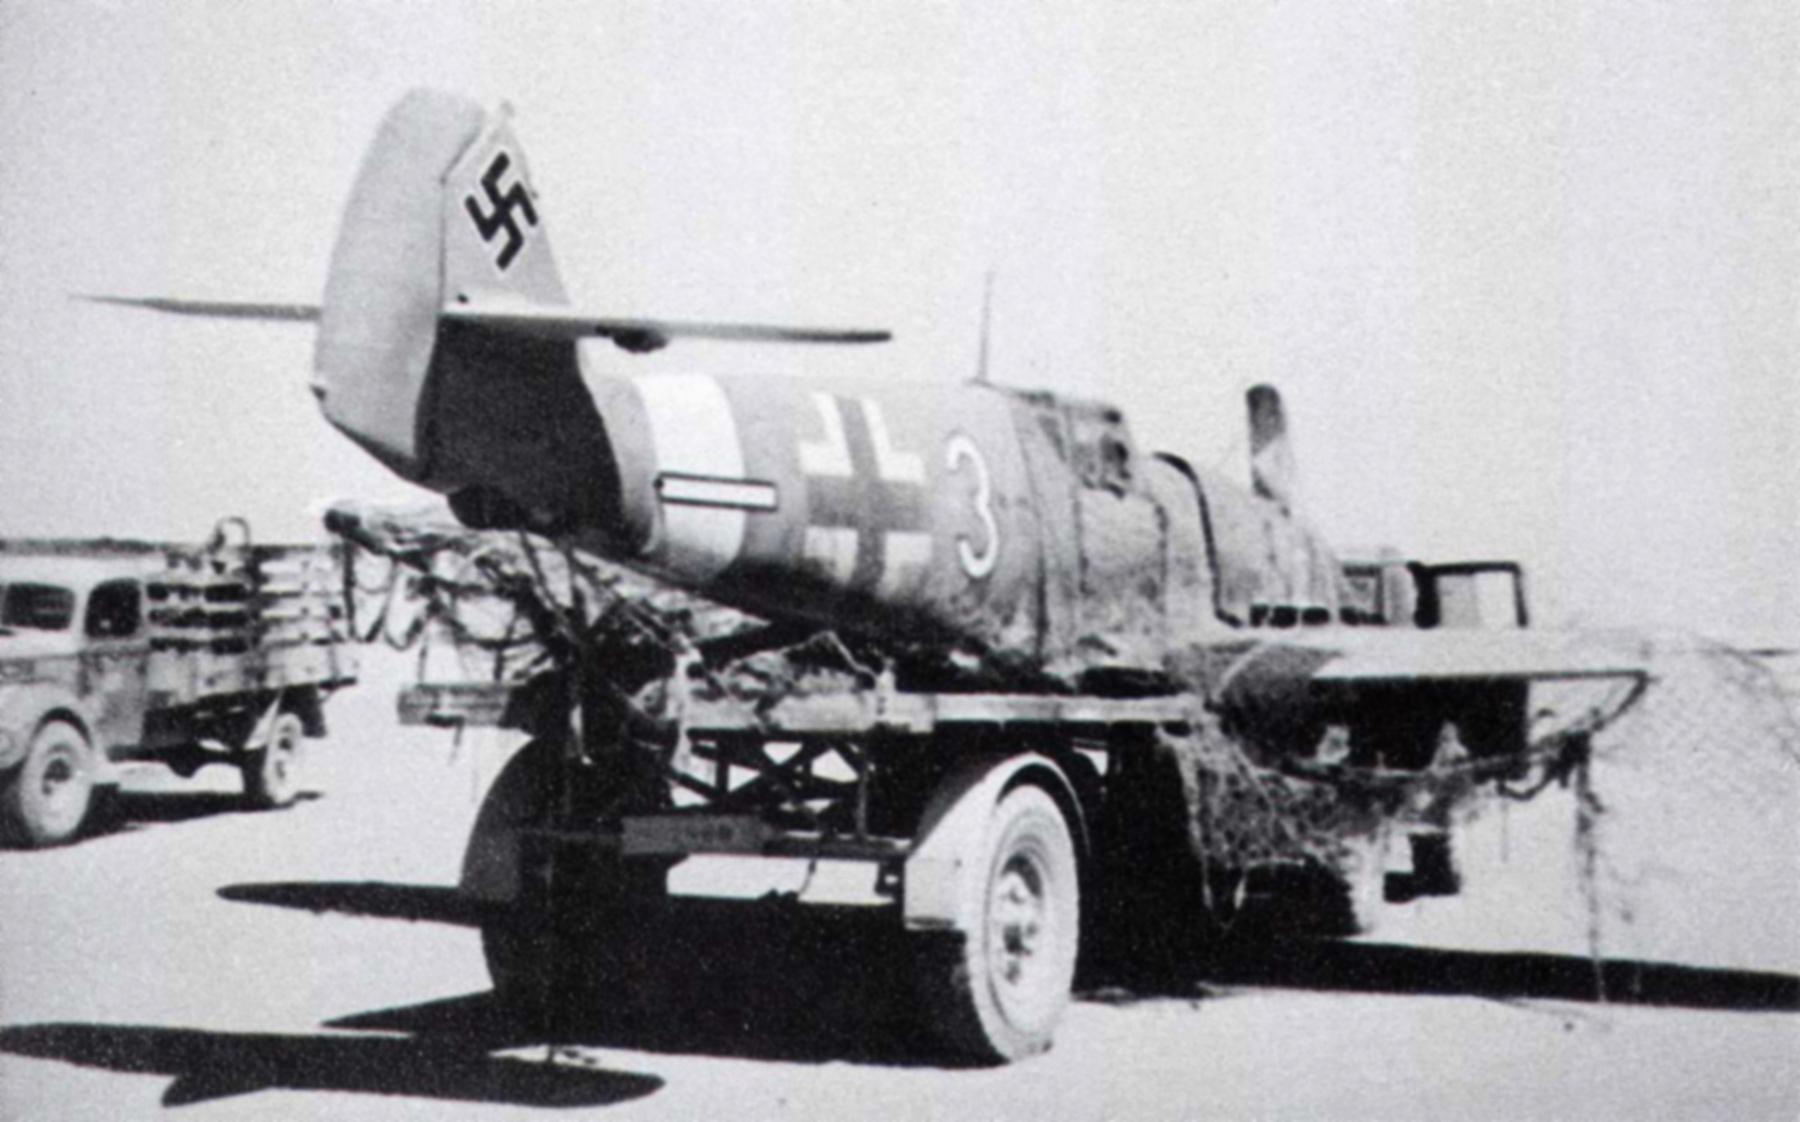 Messerschmitt Bf 109F4Trop 4.JG27 White 3 Alfred Krumlauf WNr 8635 FL 15km SW El Hammam 20th Sep 1942 02